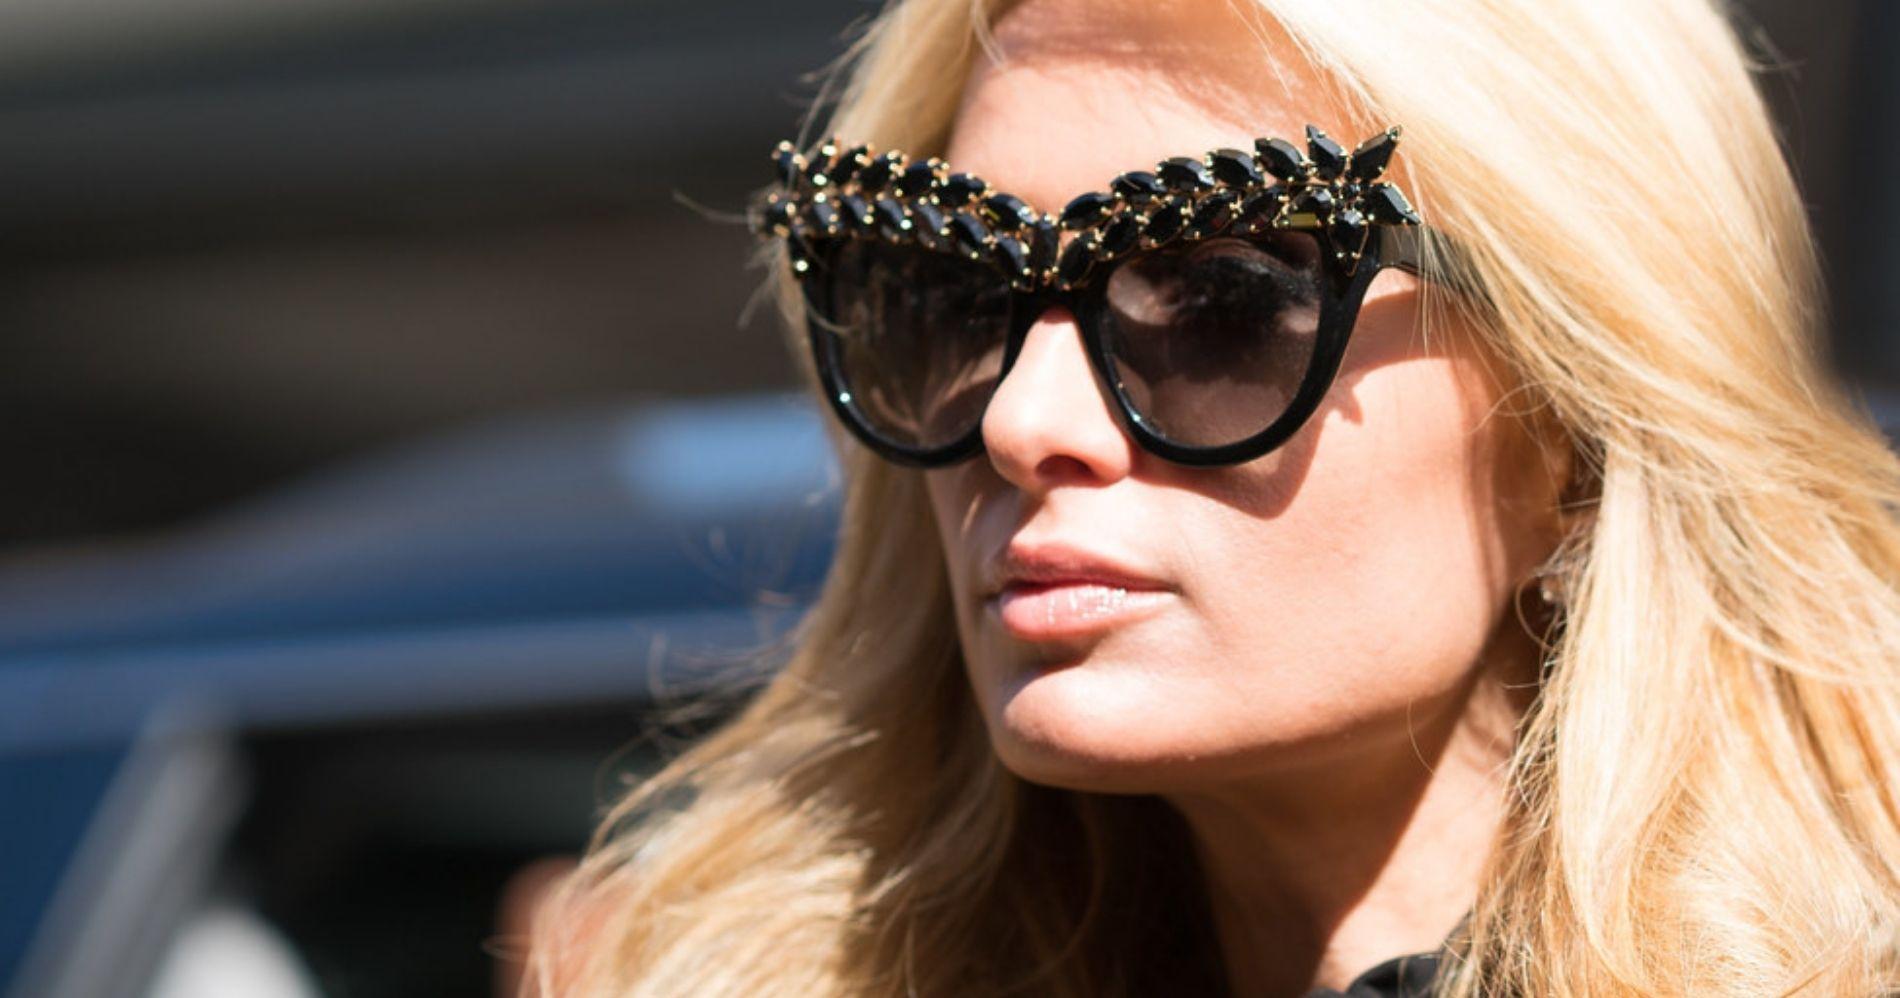 Paris Hilton Tertarik NFT Illustration Web Bisnis Muda - Image: Flickr